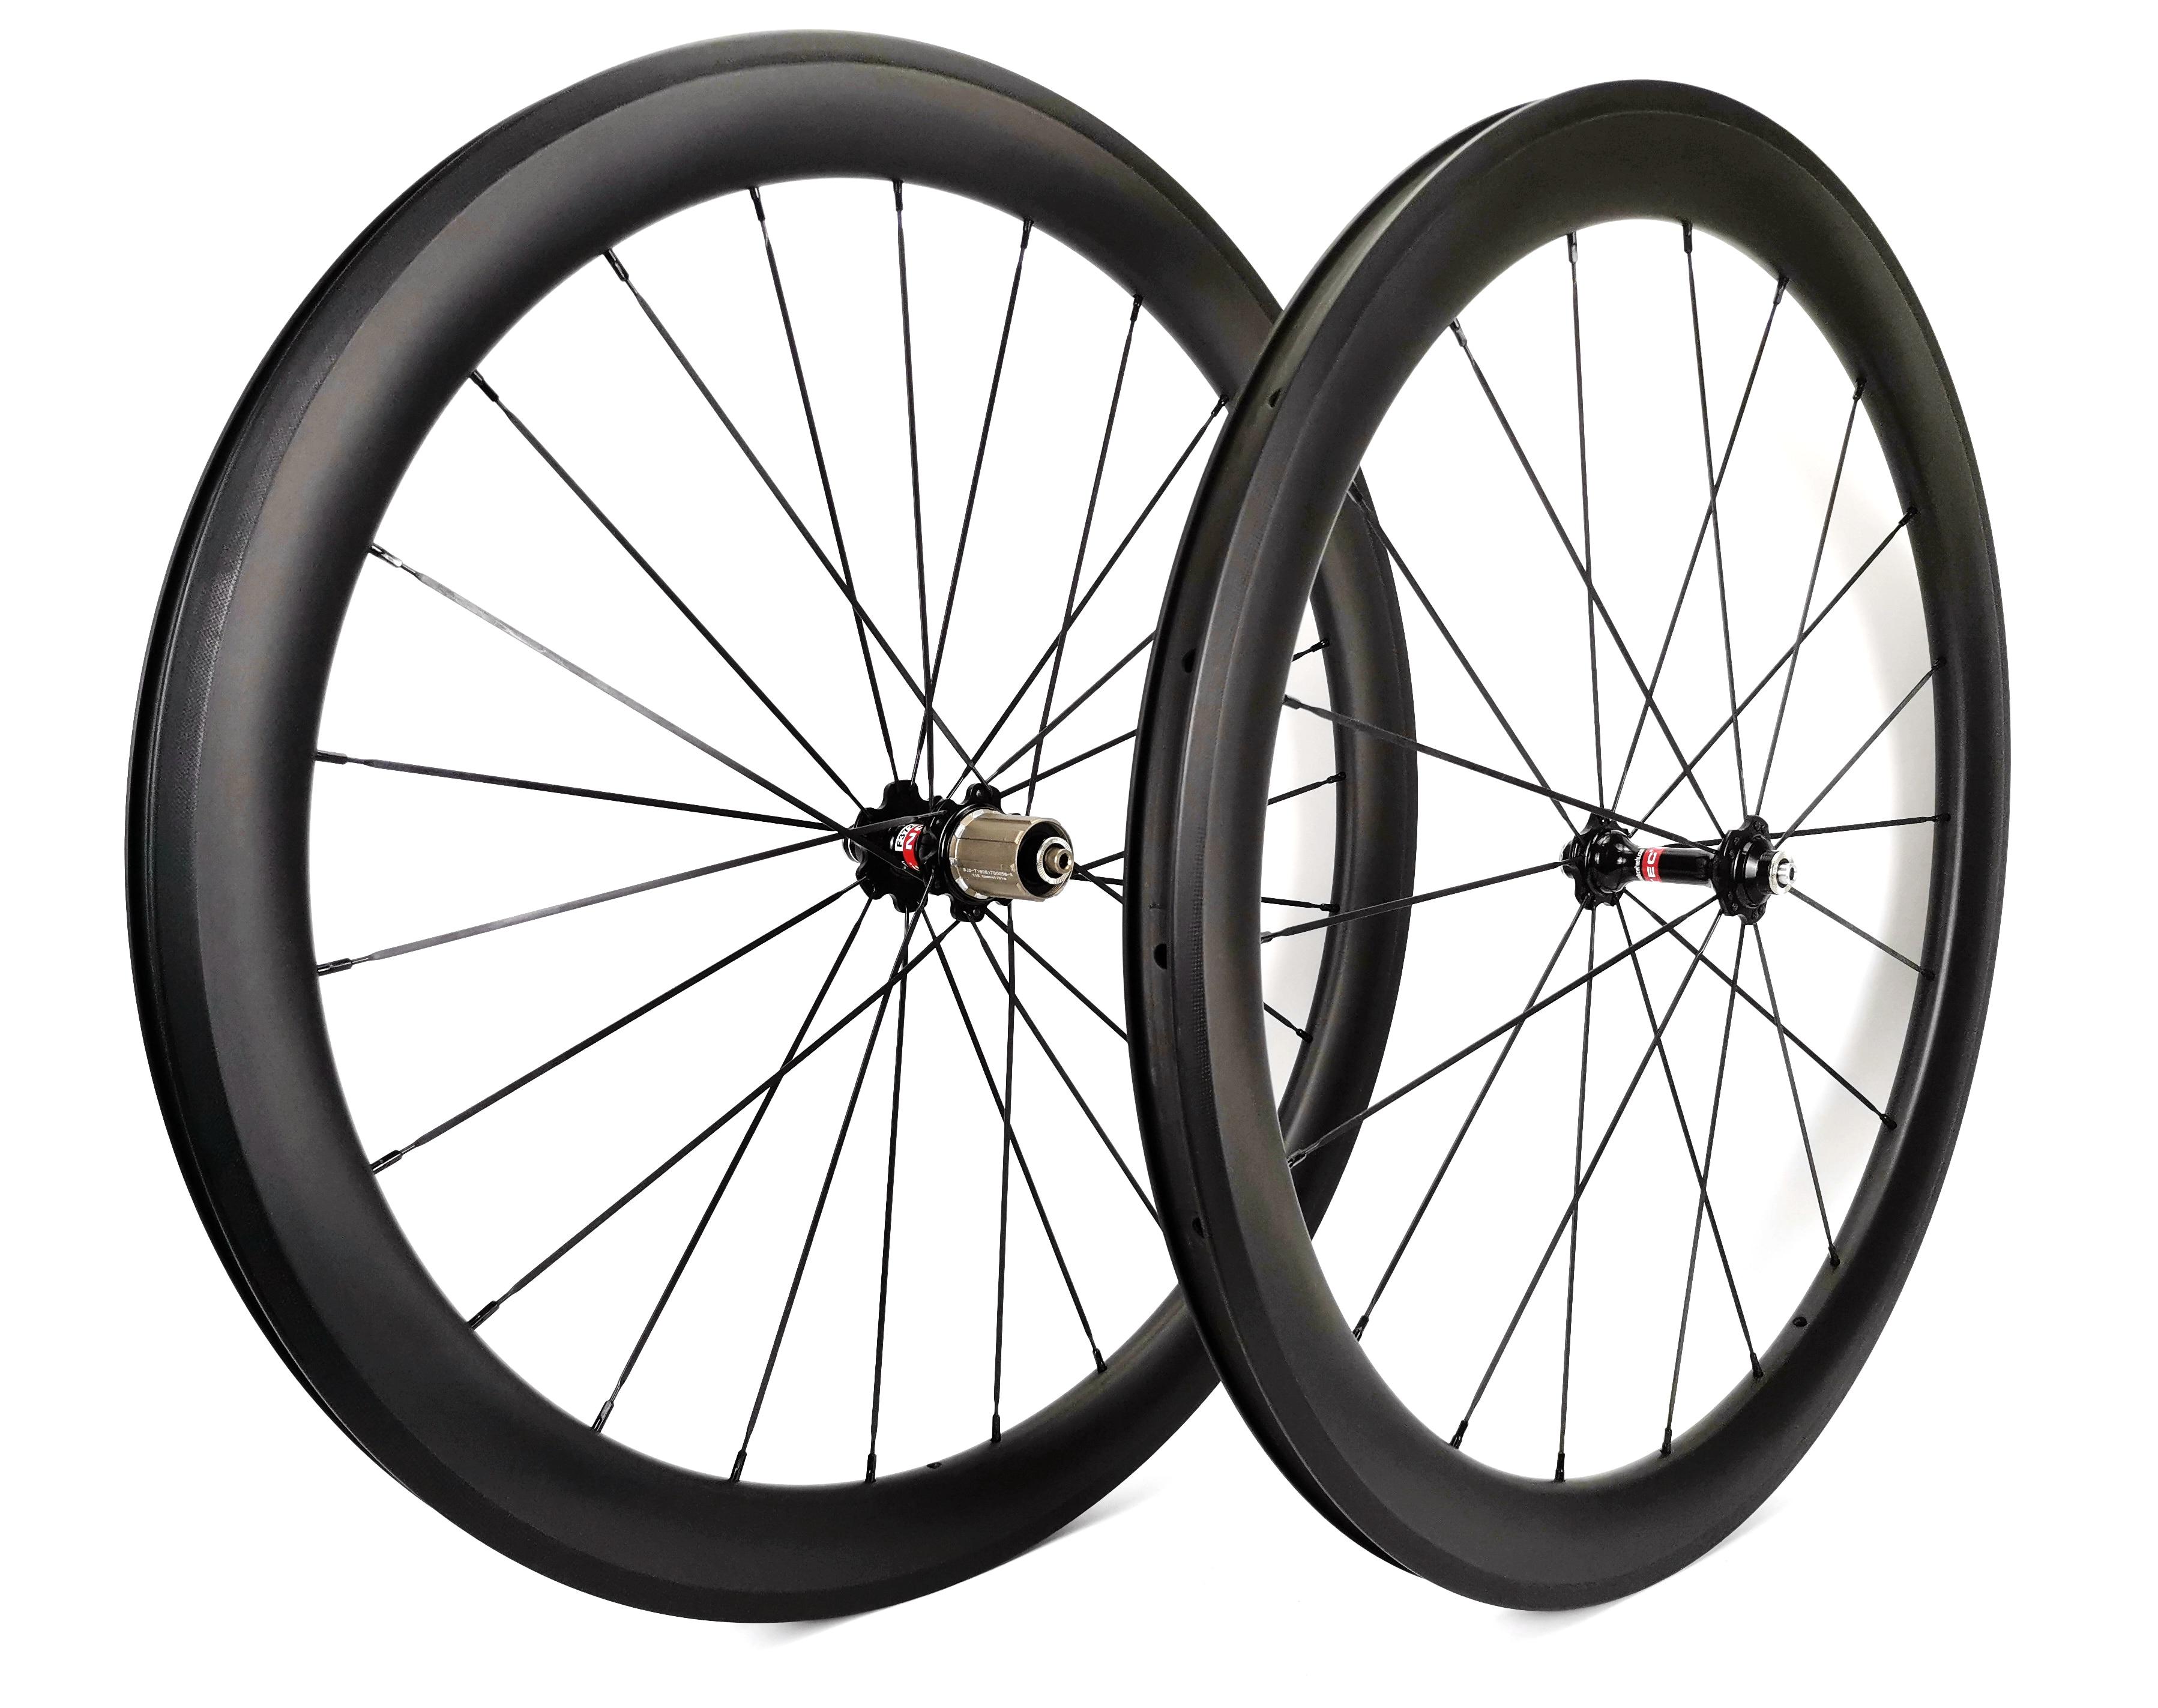 700C 50mm depth Road bike carbon wheels 25mm width bicycle clincher Tubular carbon wheelset U shape